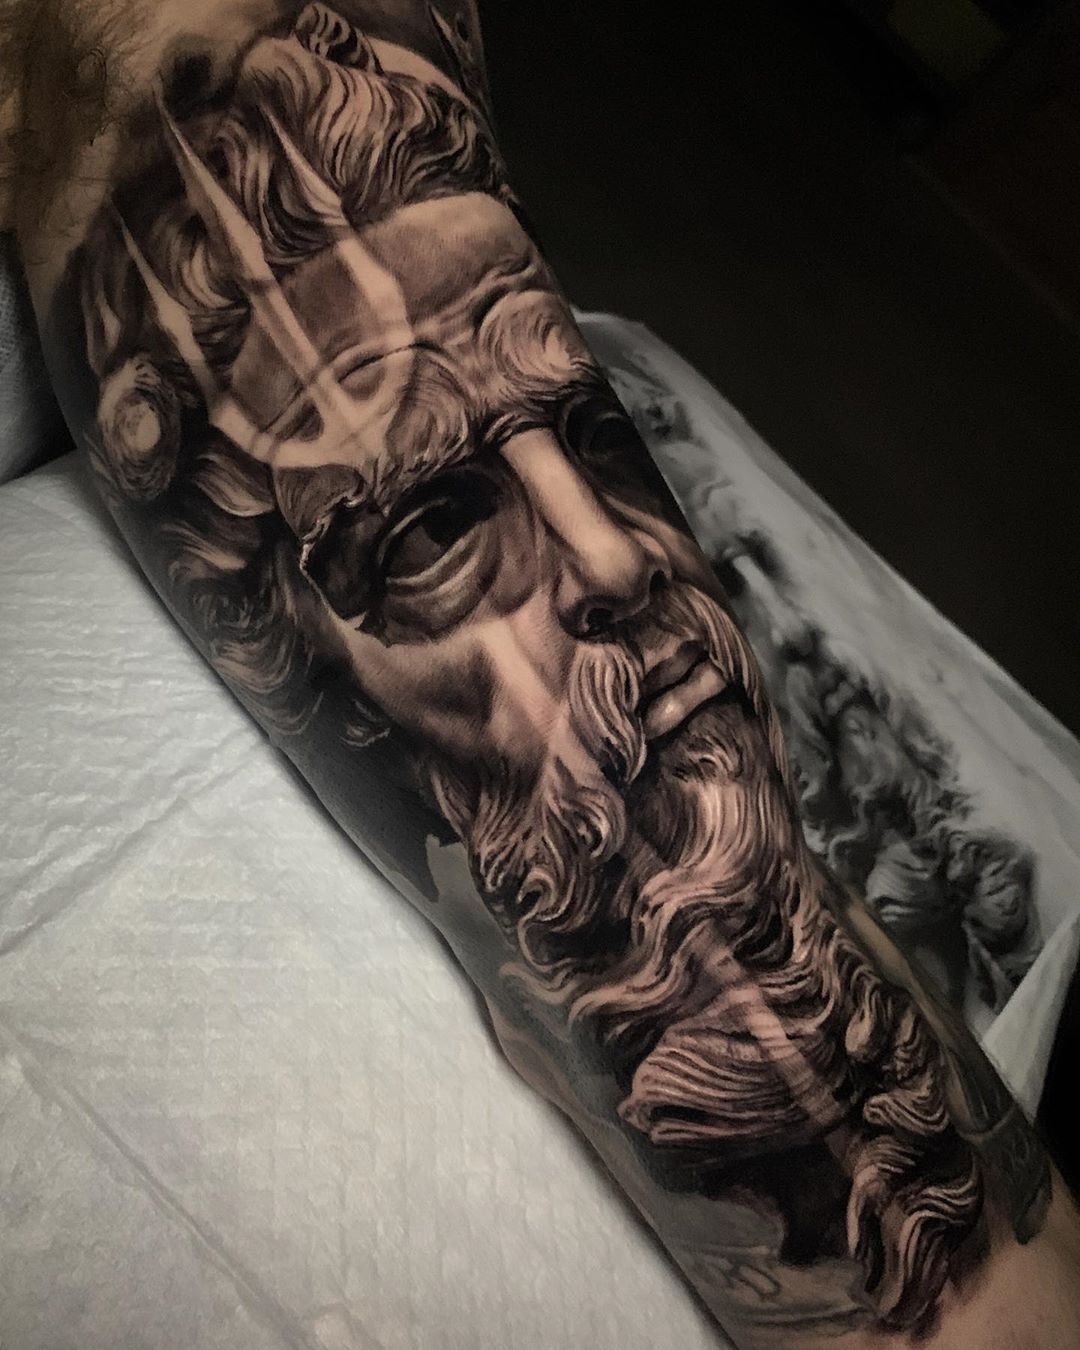 Poseidon Artist Dylanwebertattoos Follow Skingiants For Daily Tattoo Greek Tattoos Mythology Tattoos Poseidon Tattoo